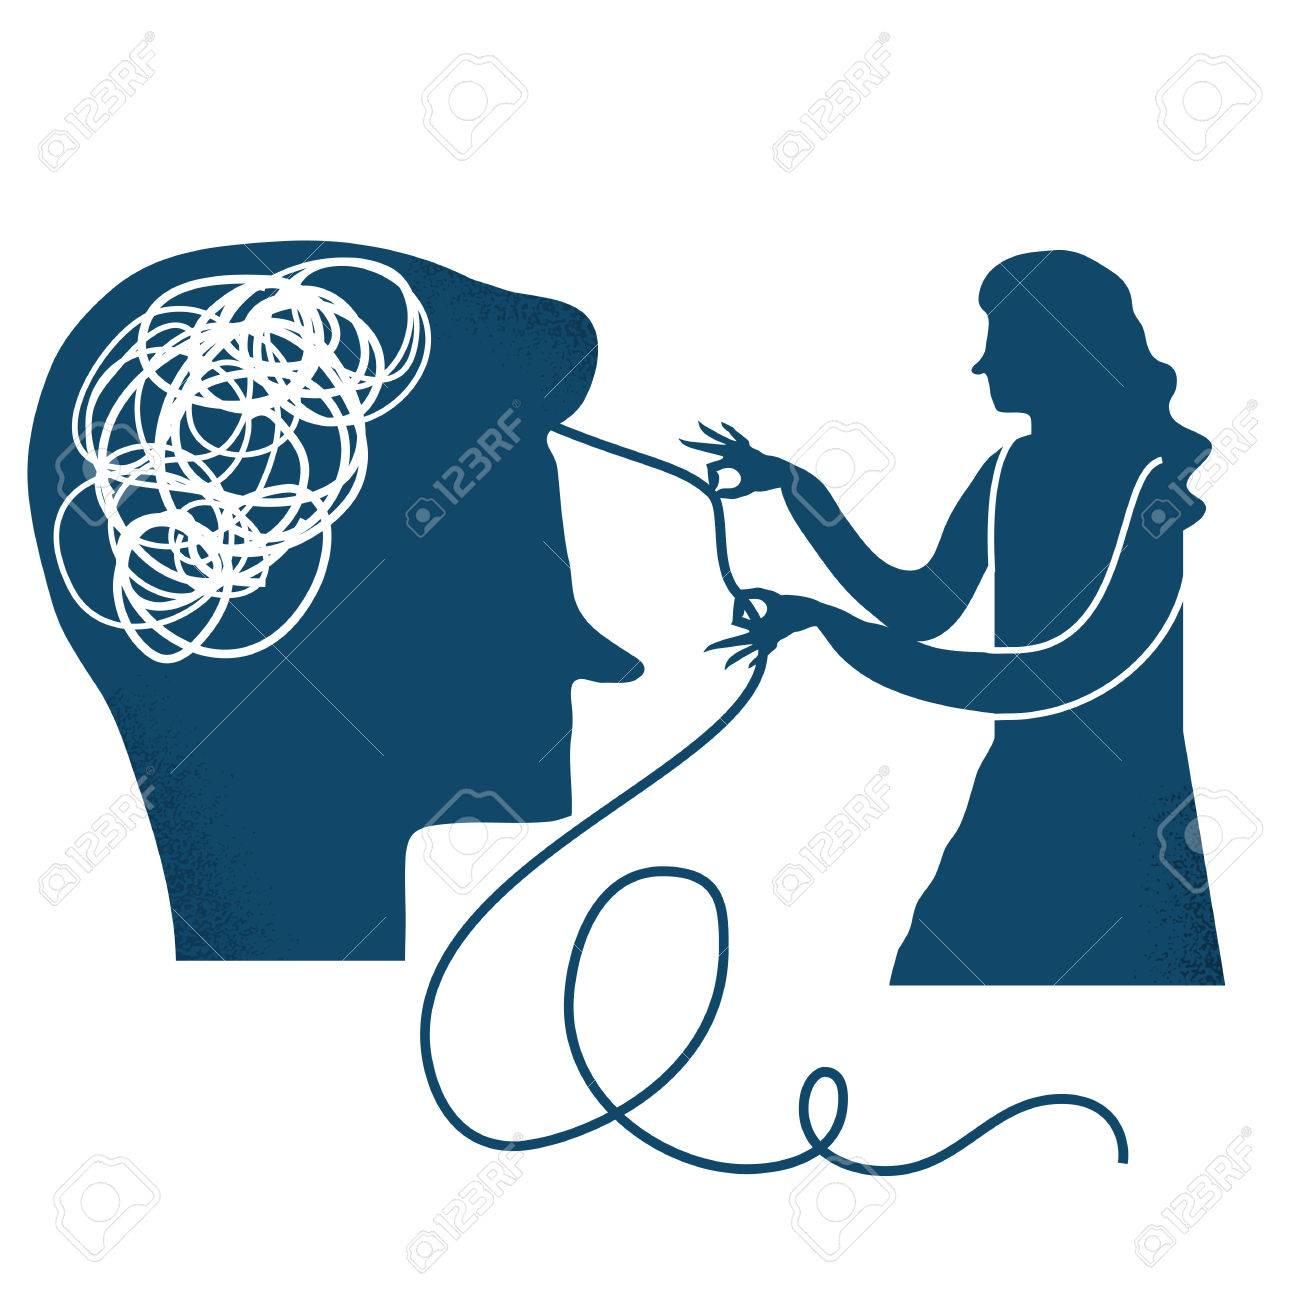 Psychotherapy Healing Radio Frequency Circuit Design W Alan Davis Inbunden Playful Language In And Everyday Life Array Psychology Mental Concept Vector Rh 123rf Com